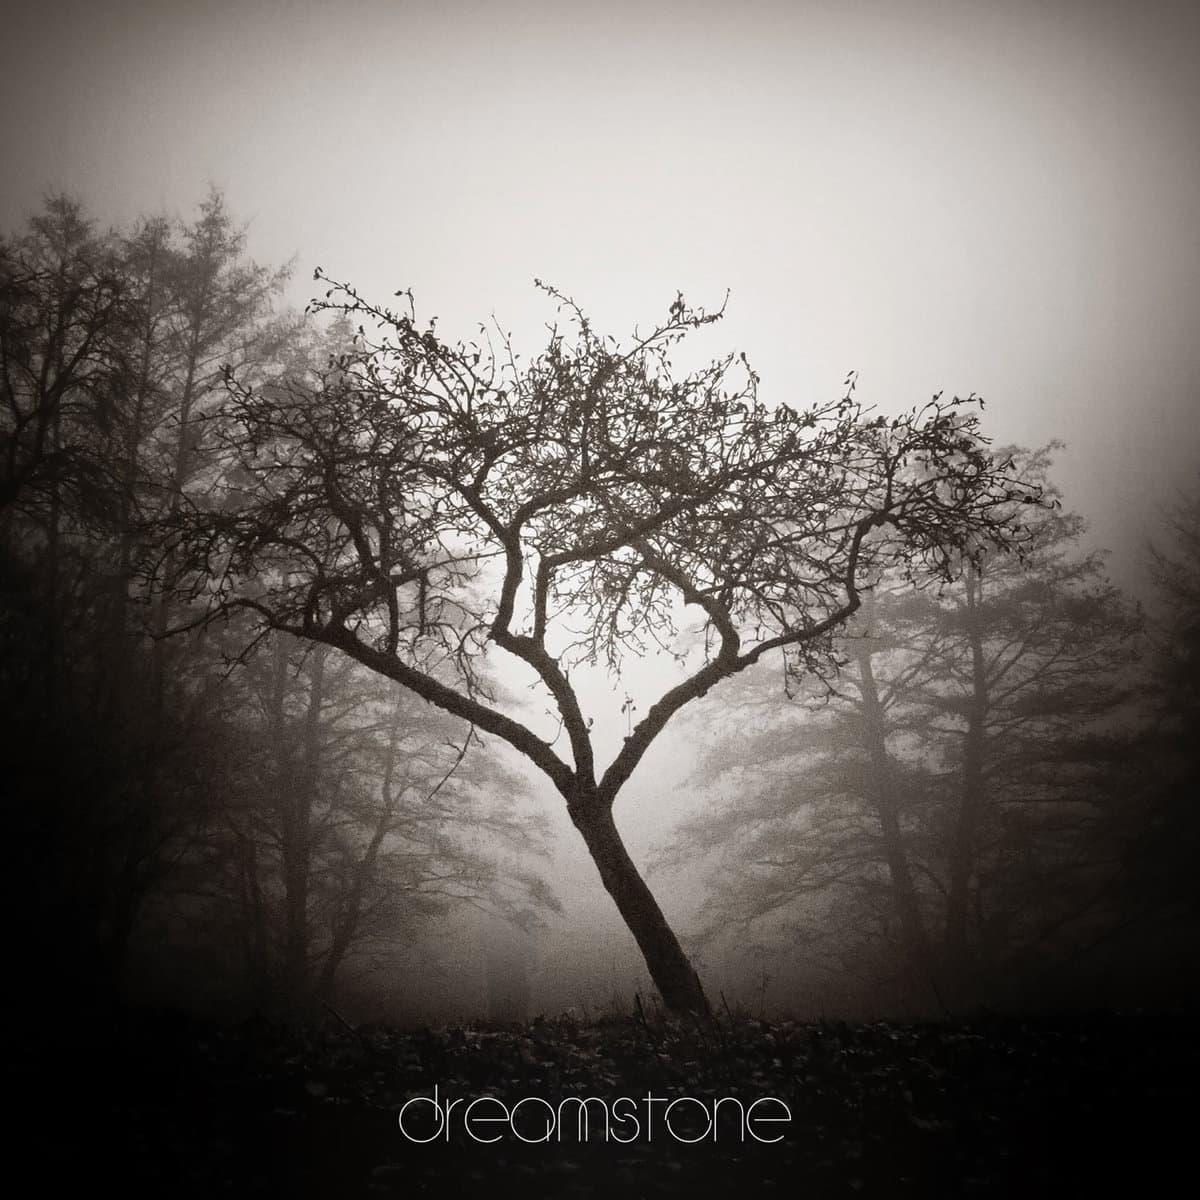 Sorrow, Dreamstone